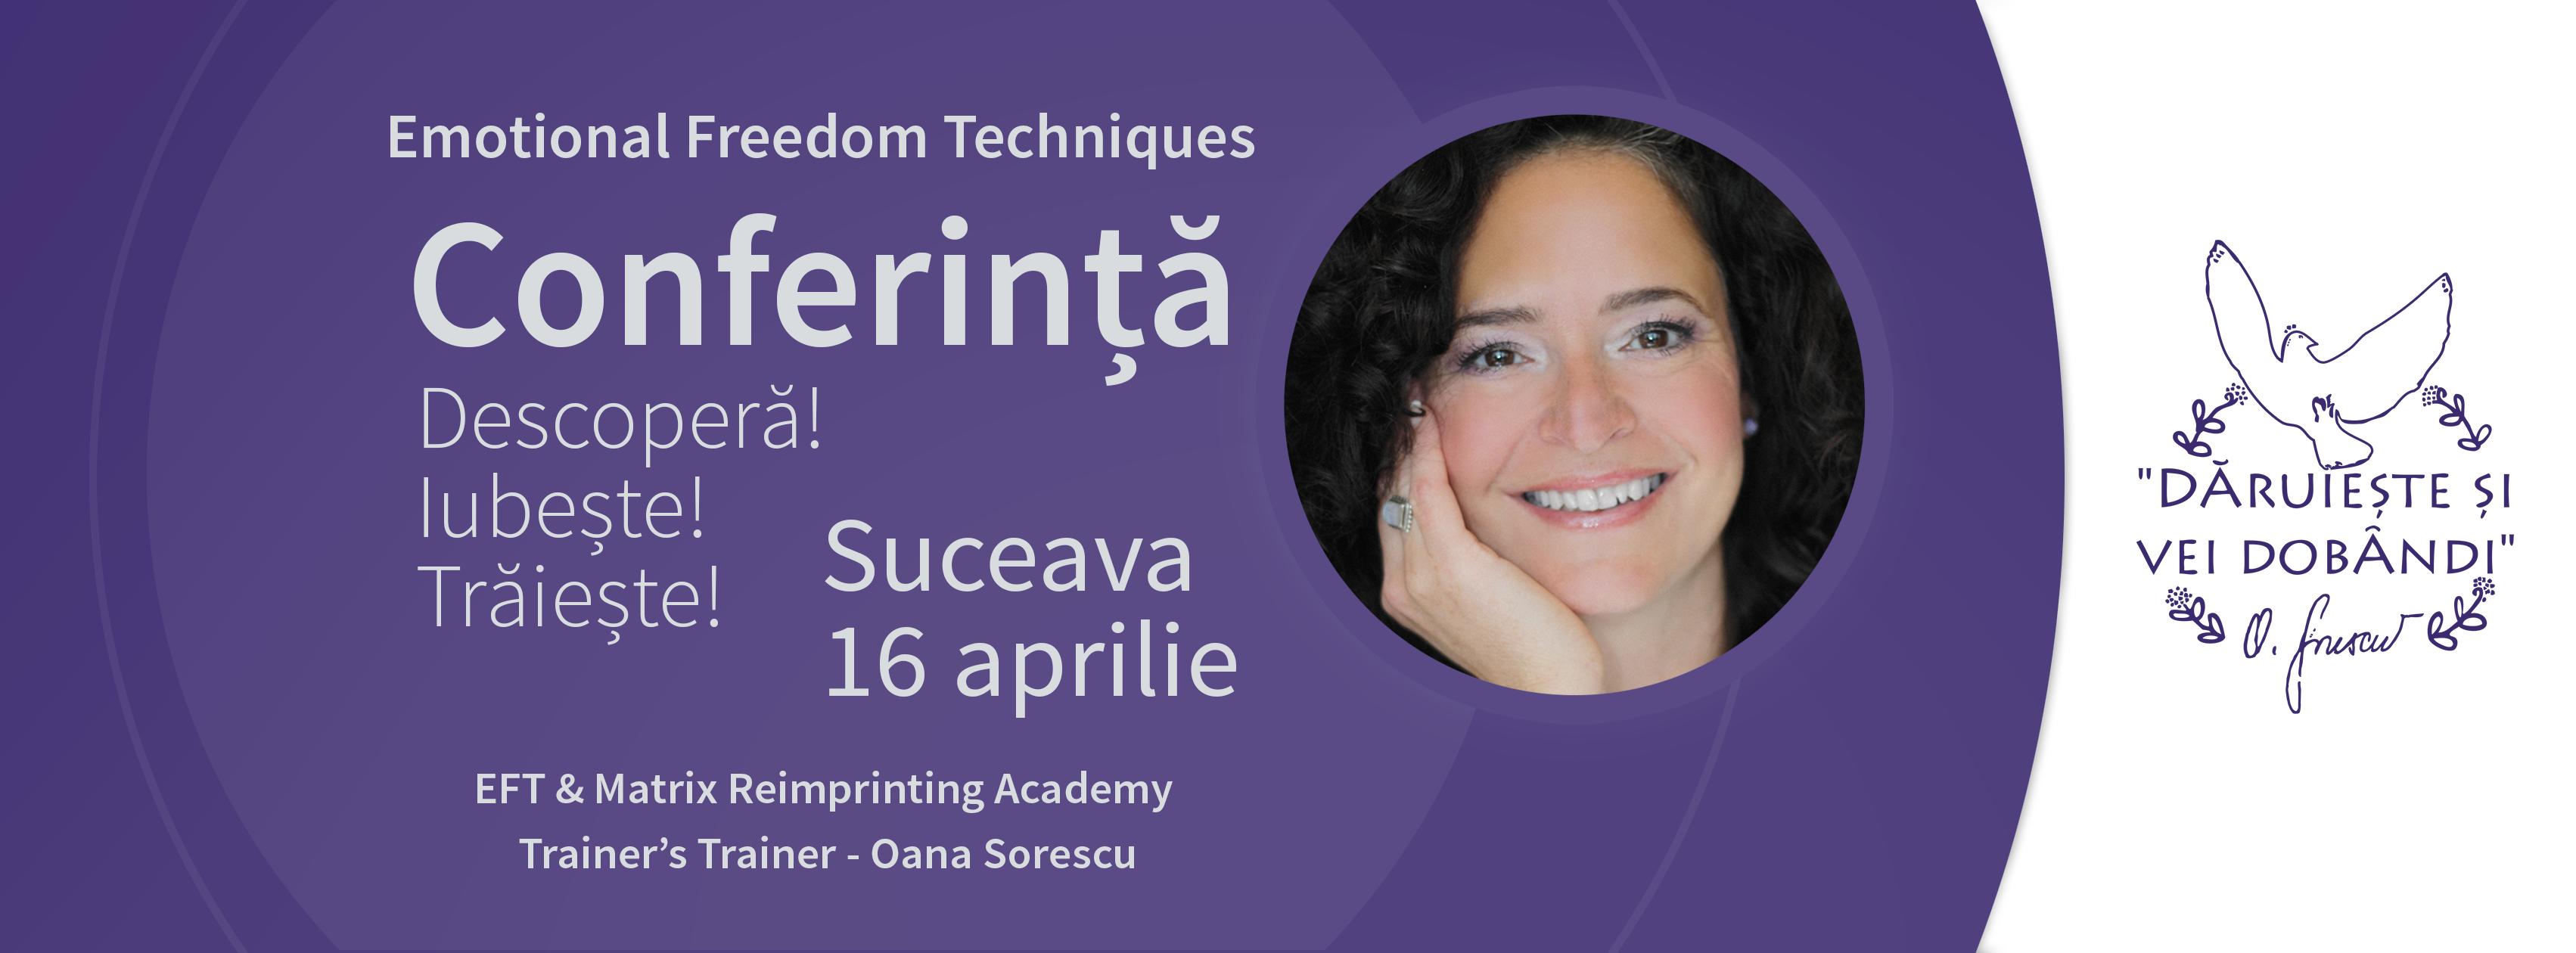 16_aprilie_suceava_conferinta